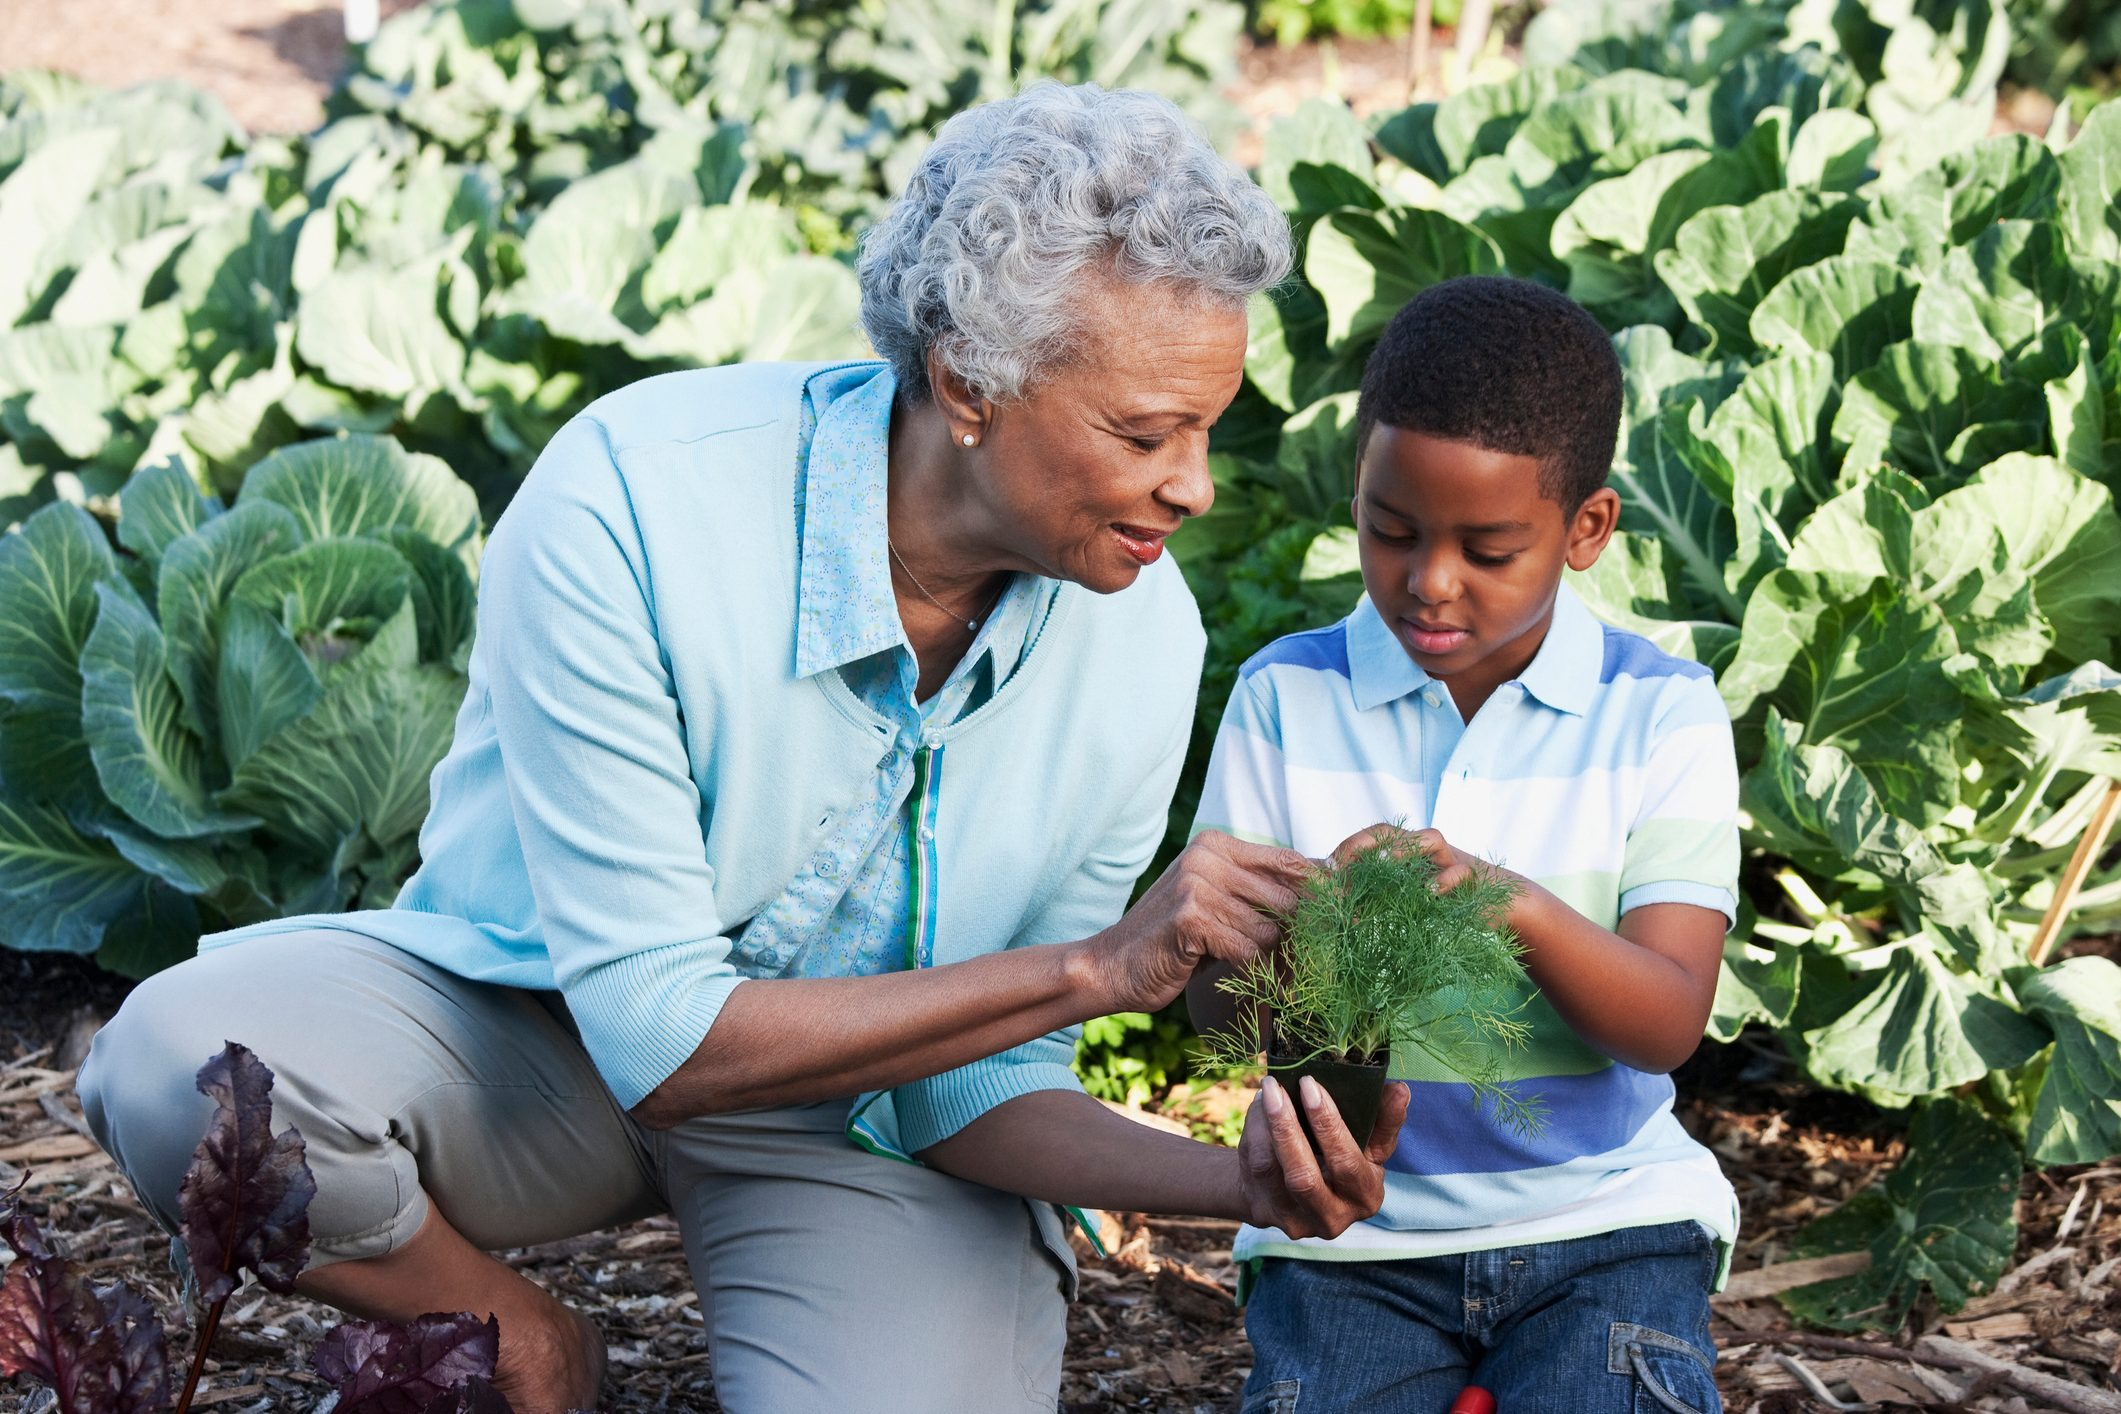 grandmother and grandson gardening in backyard